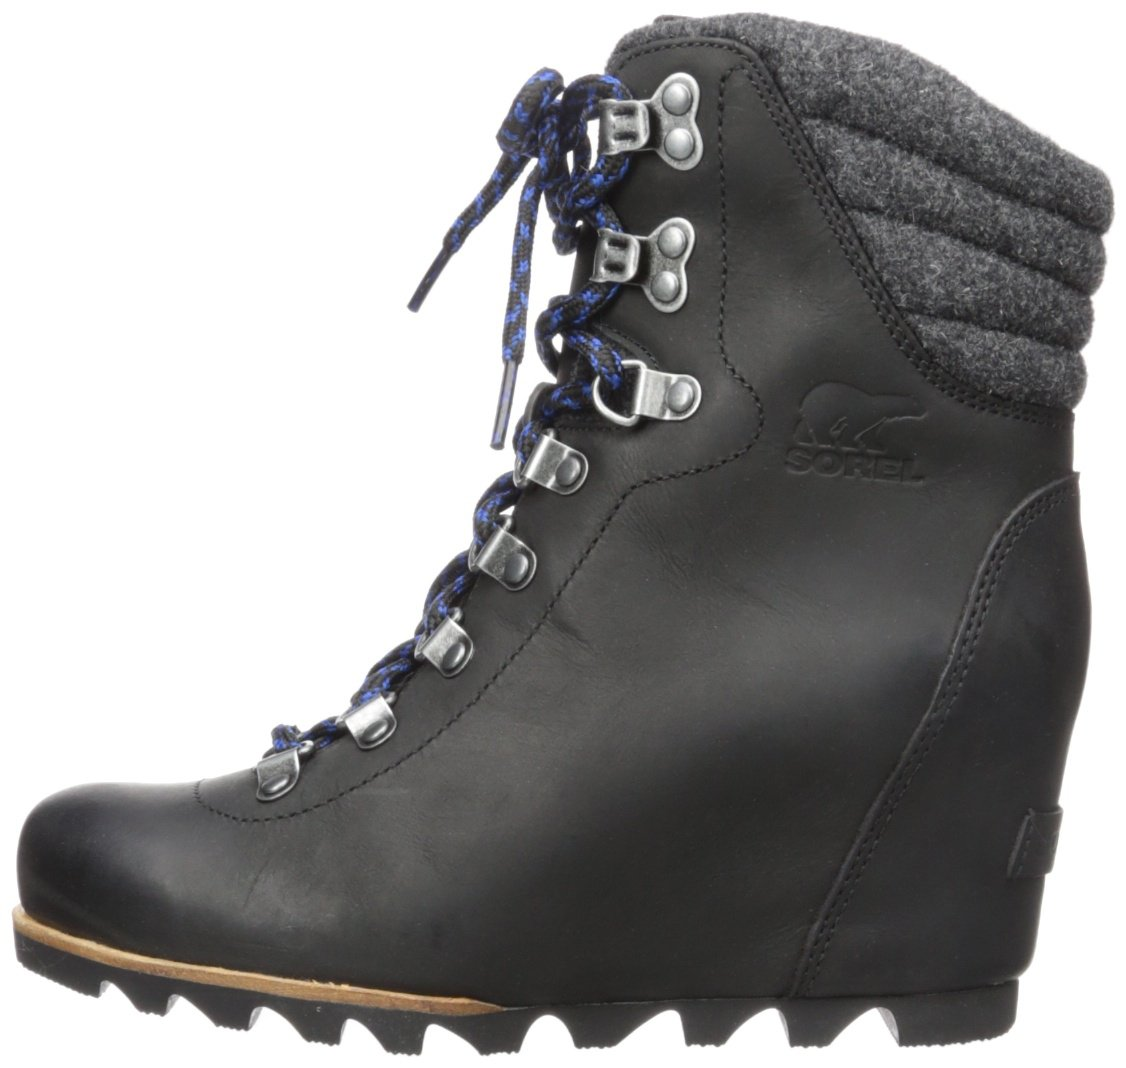 SOREL Women's Conquest Wedge Mid Calf Boot, Black, 11 M US by SOREL (Image #5)